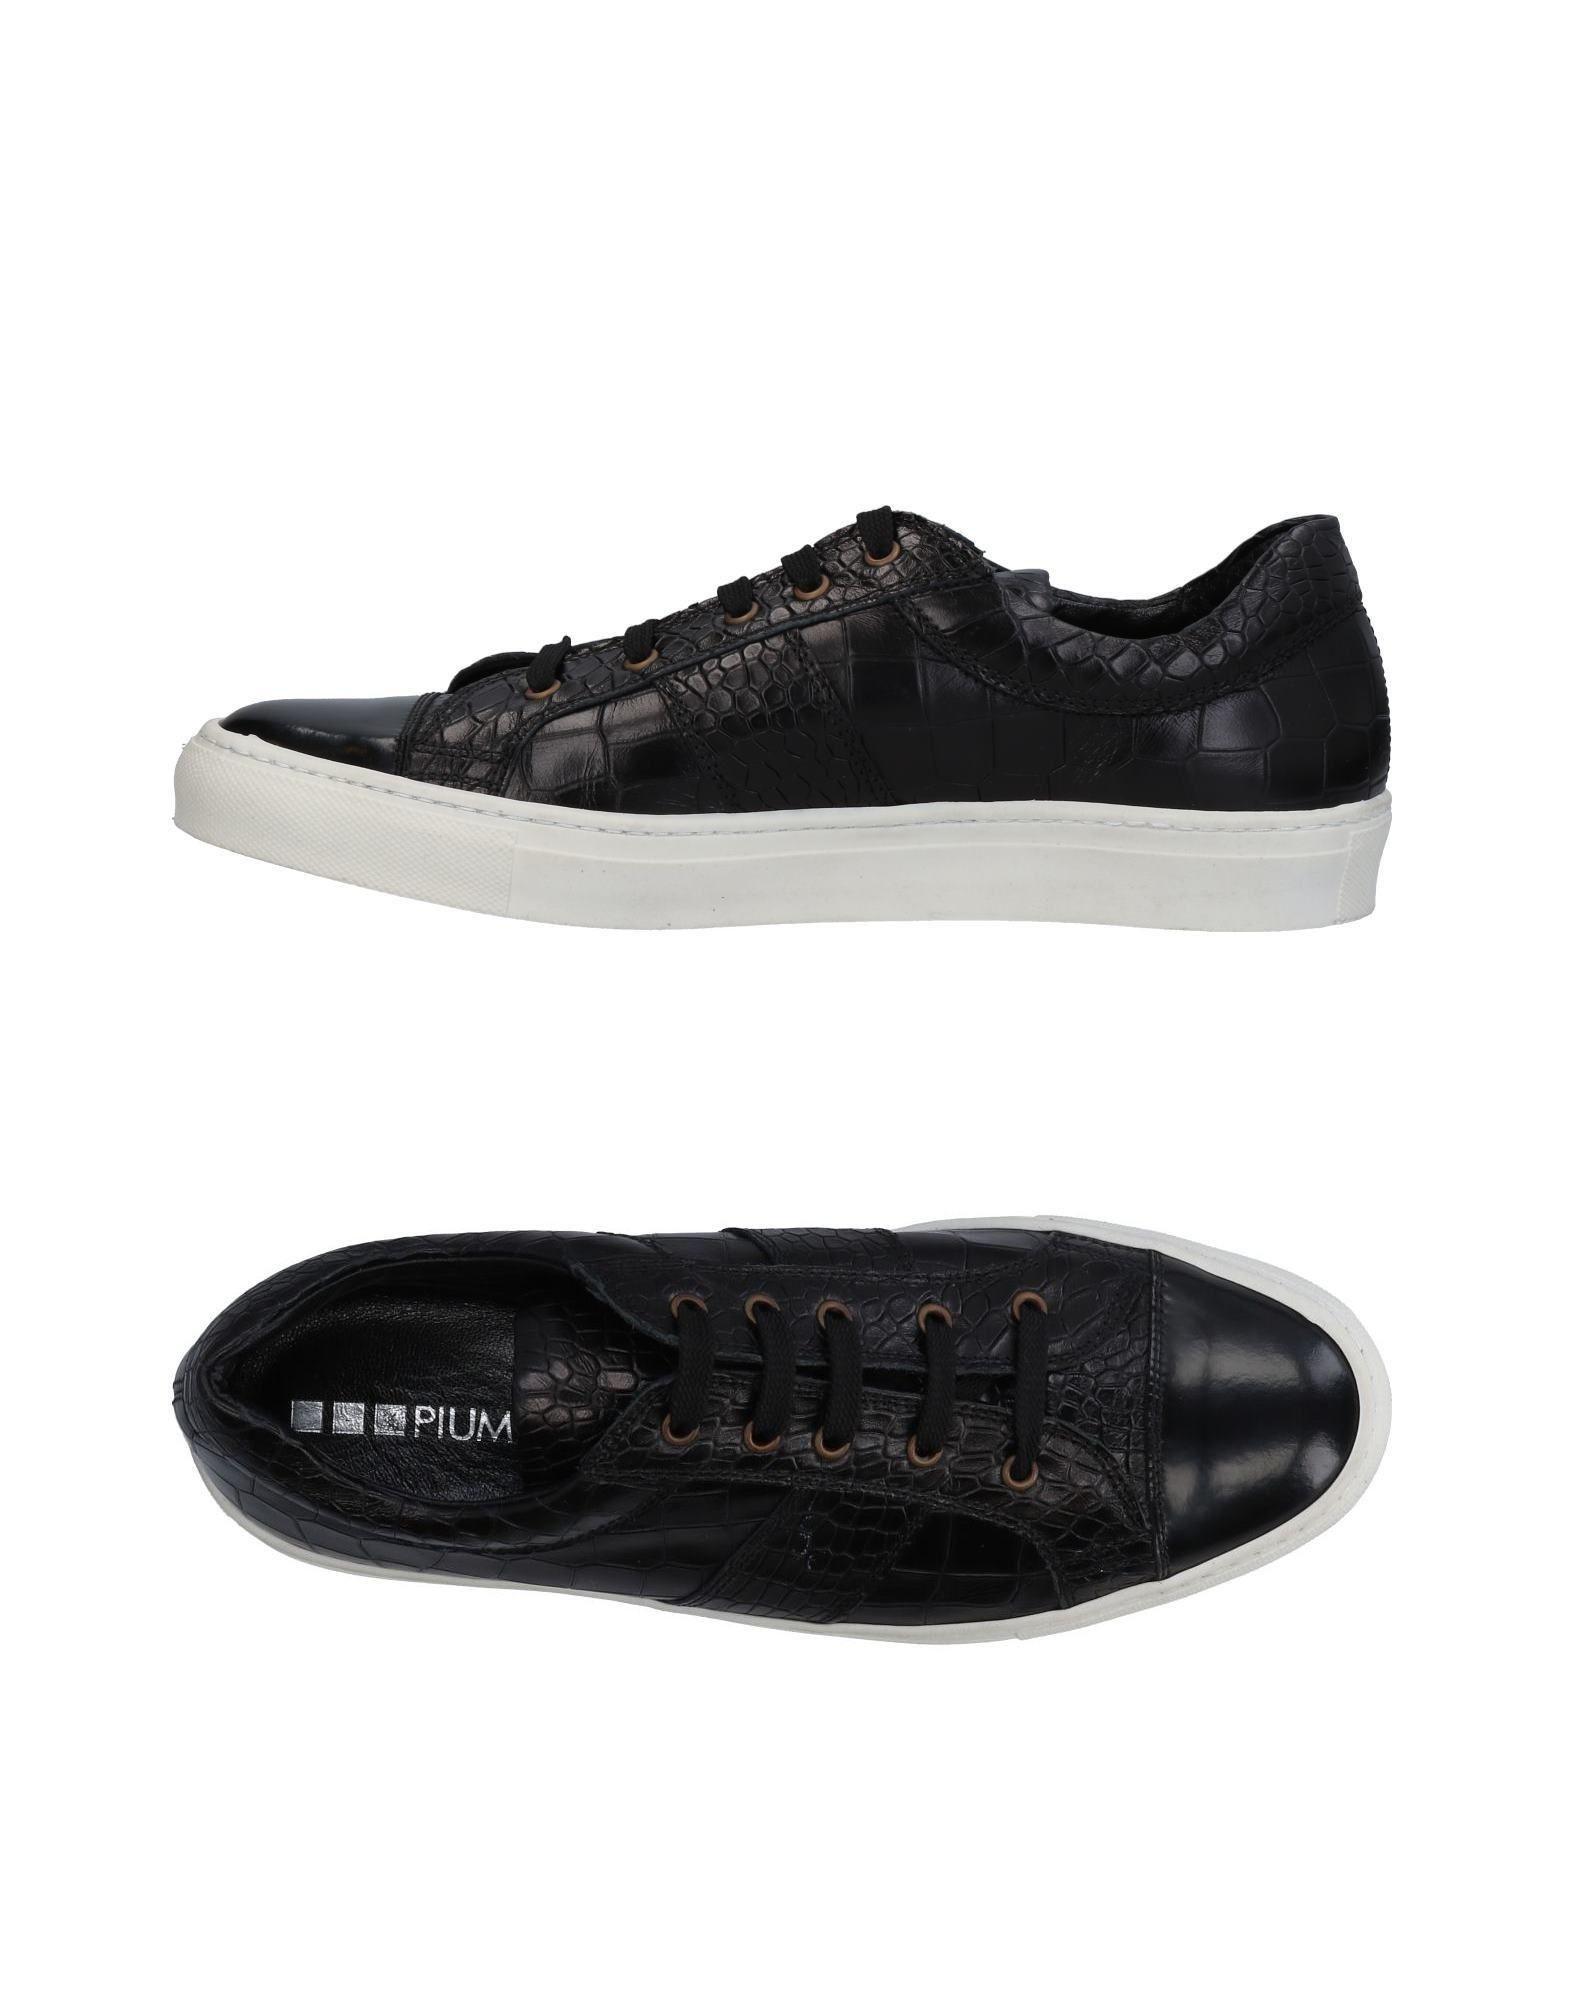 Chaussures - Bas-tops Et Baskets Piumi SAG6gWP2